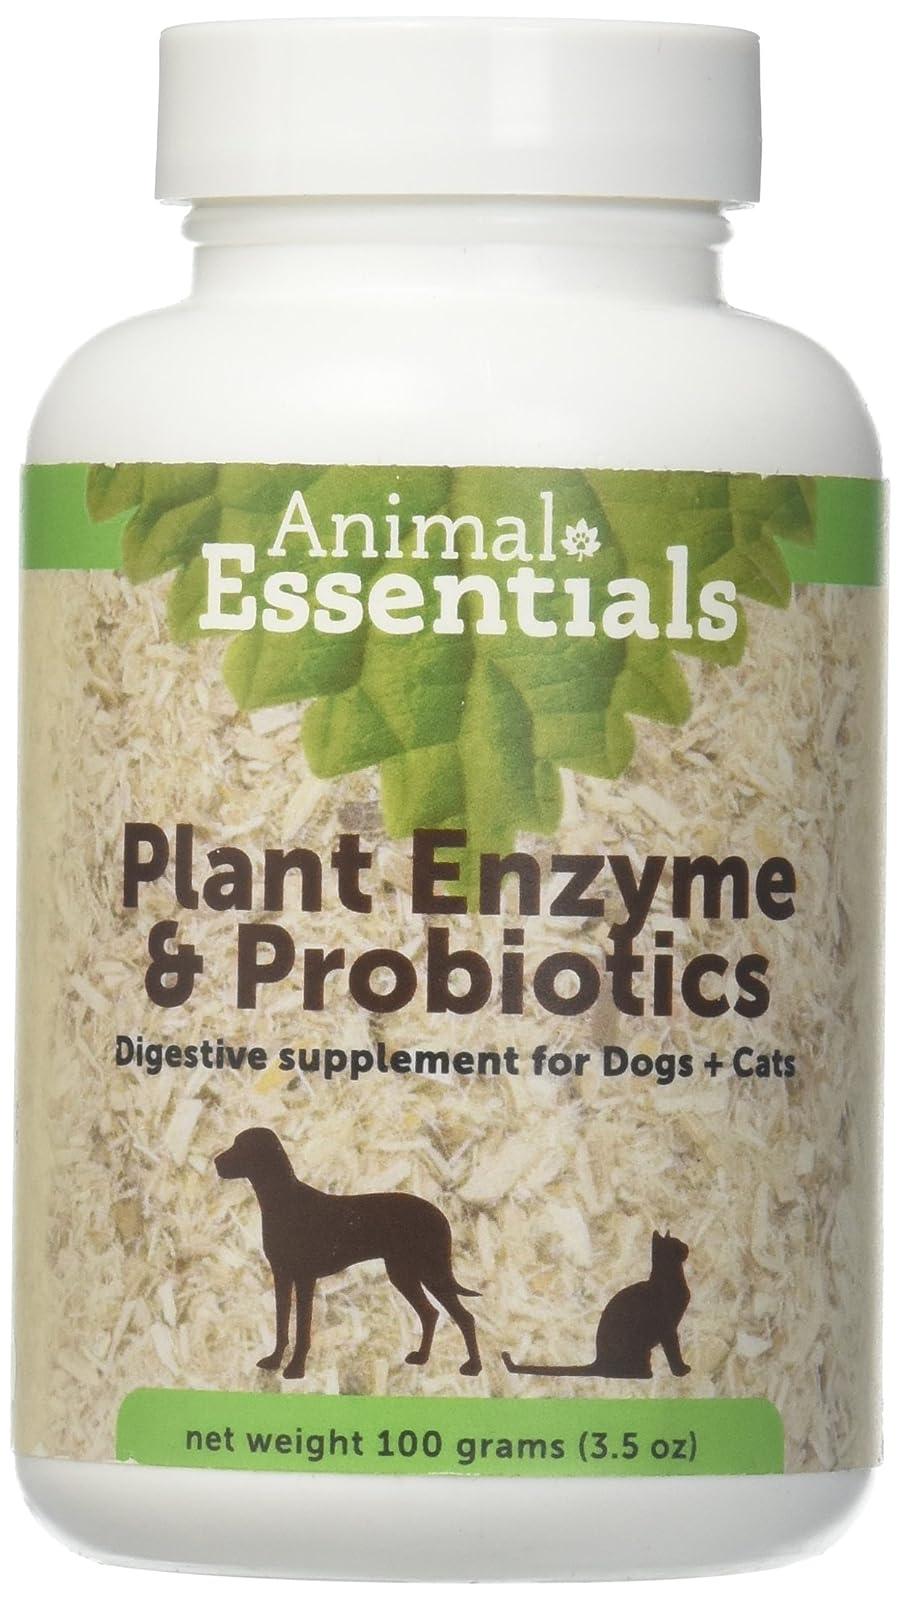 Animal Essentials Plant Enzyme & Probiotics SupplementDogs and B010F372HA - 2